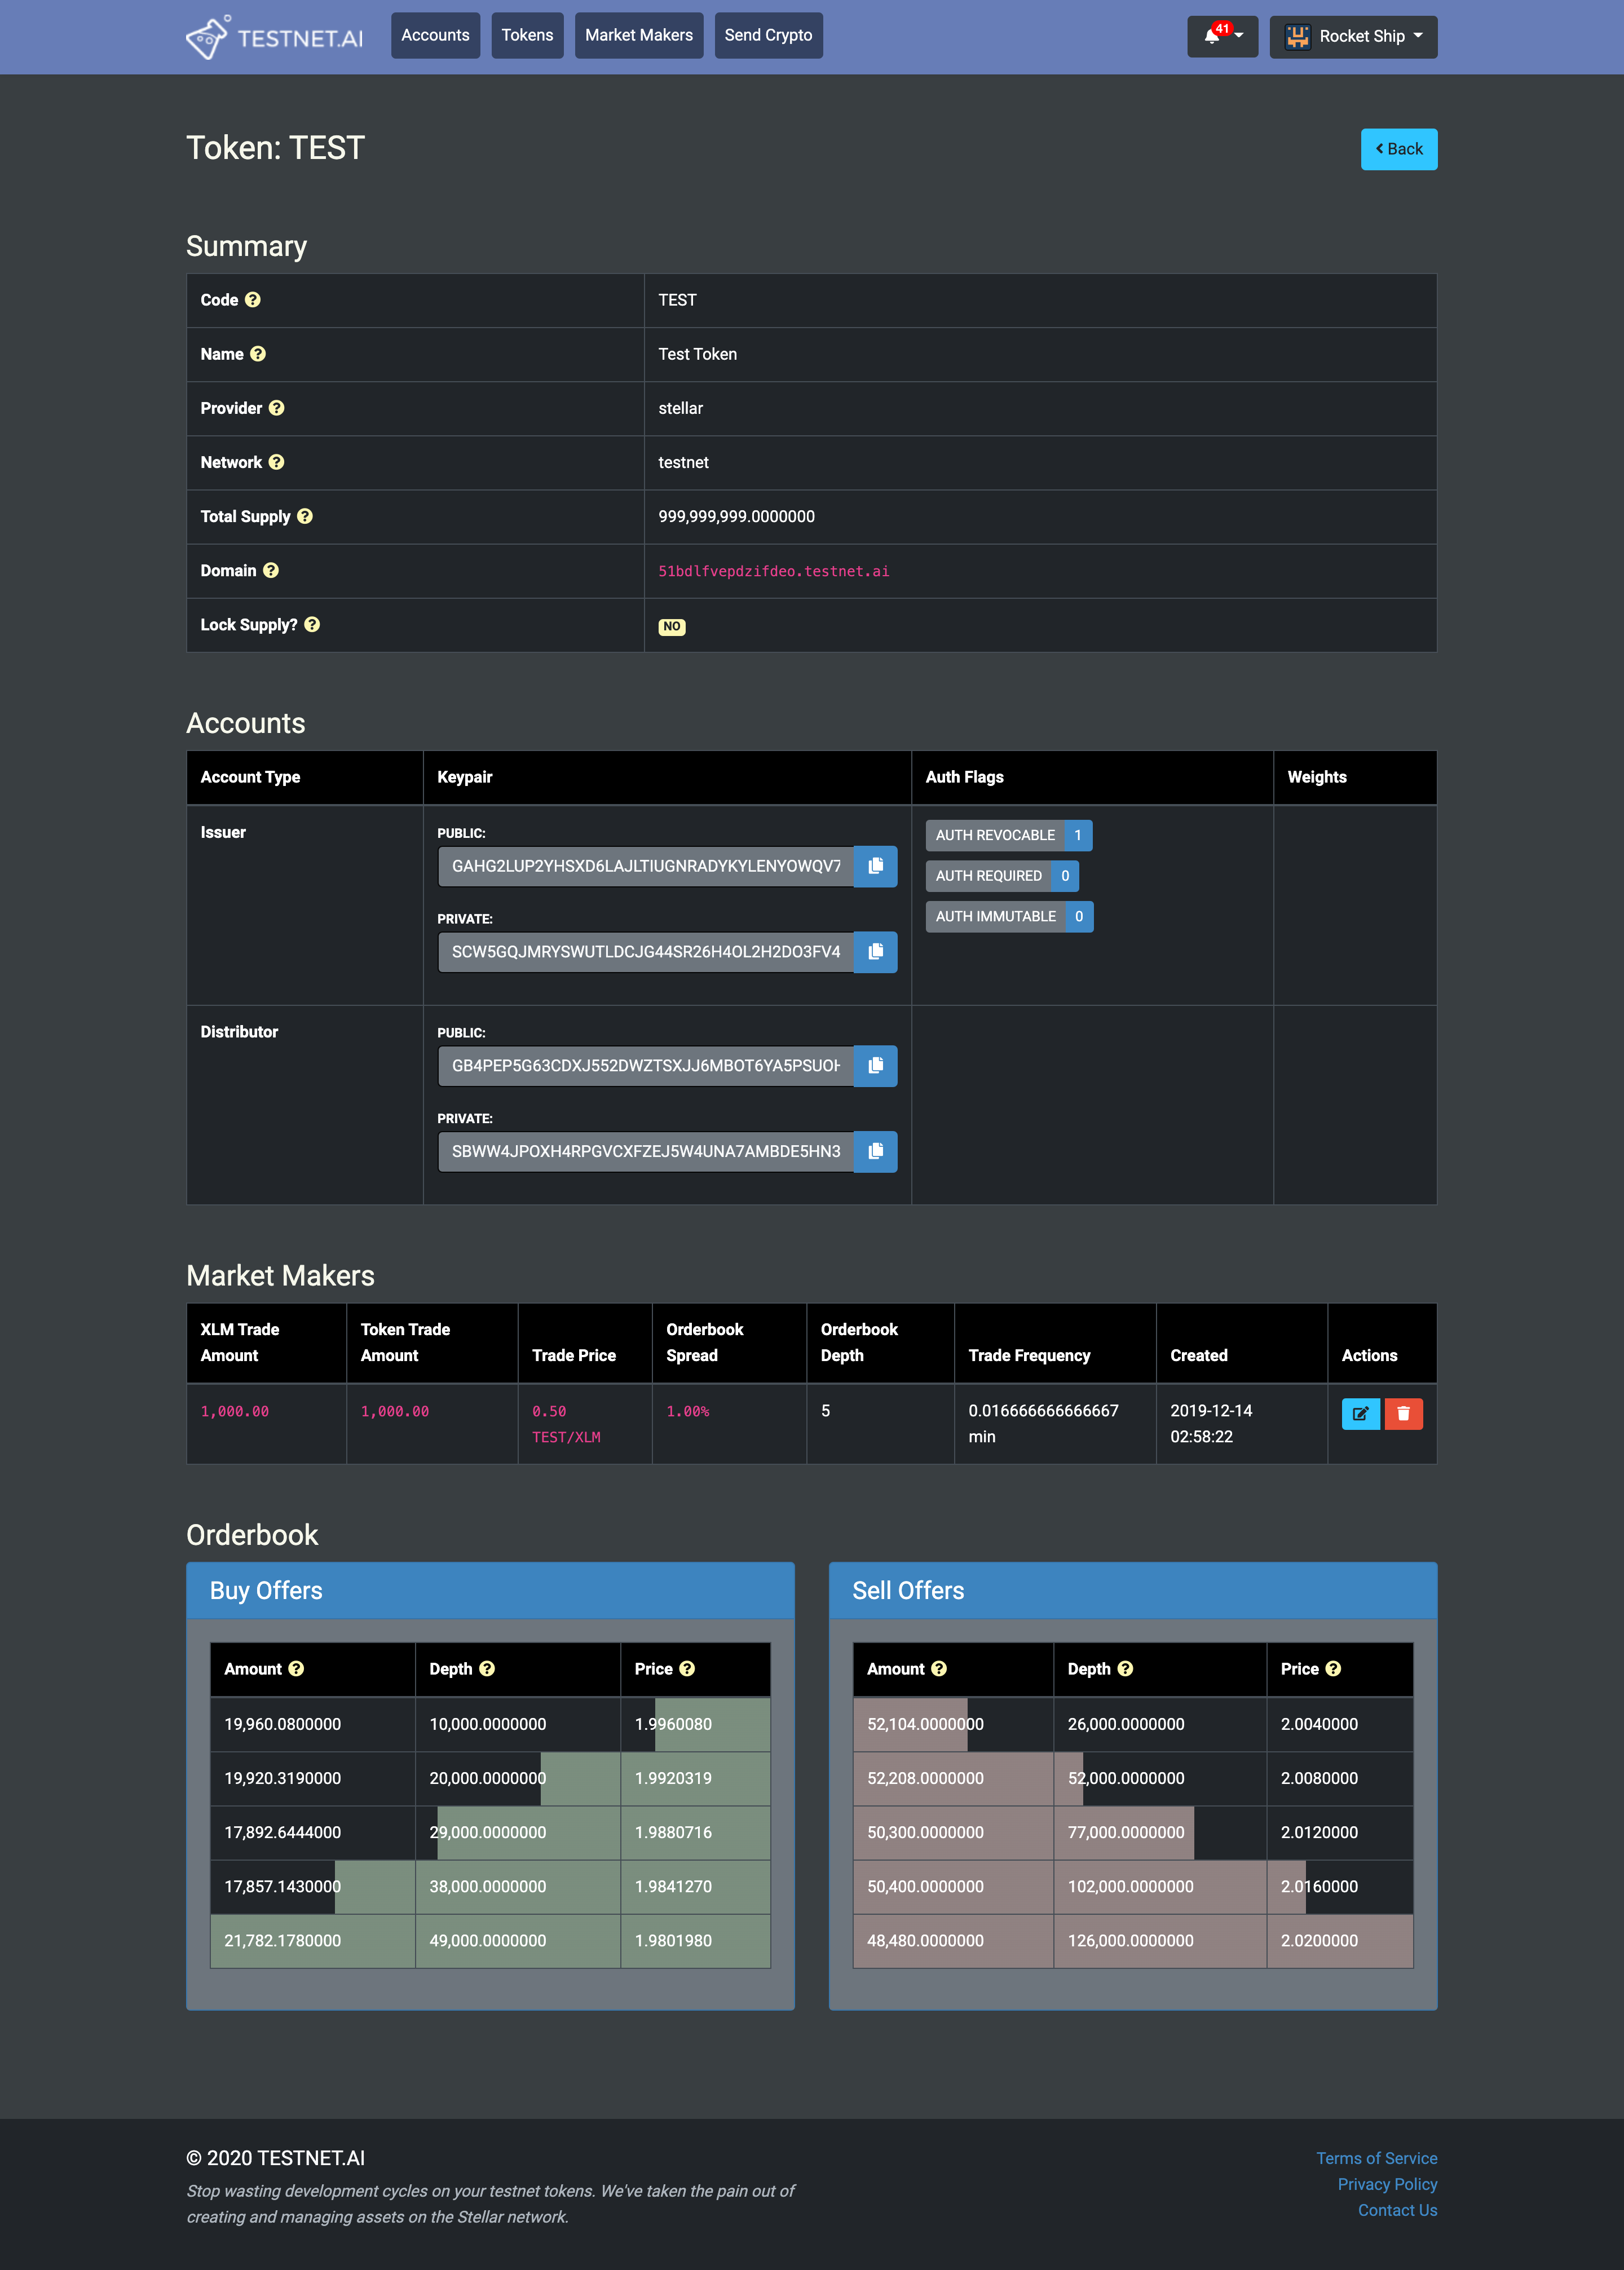 Testnet.ai - Asset Details